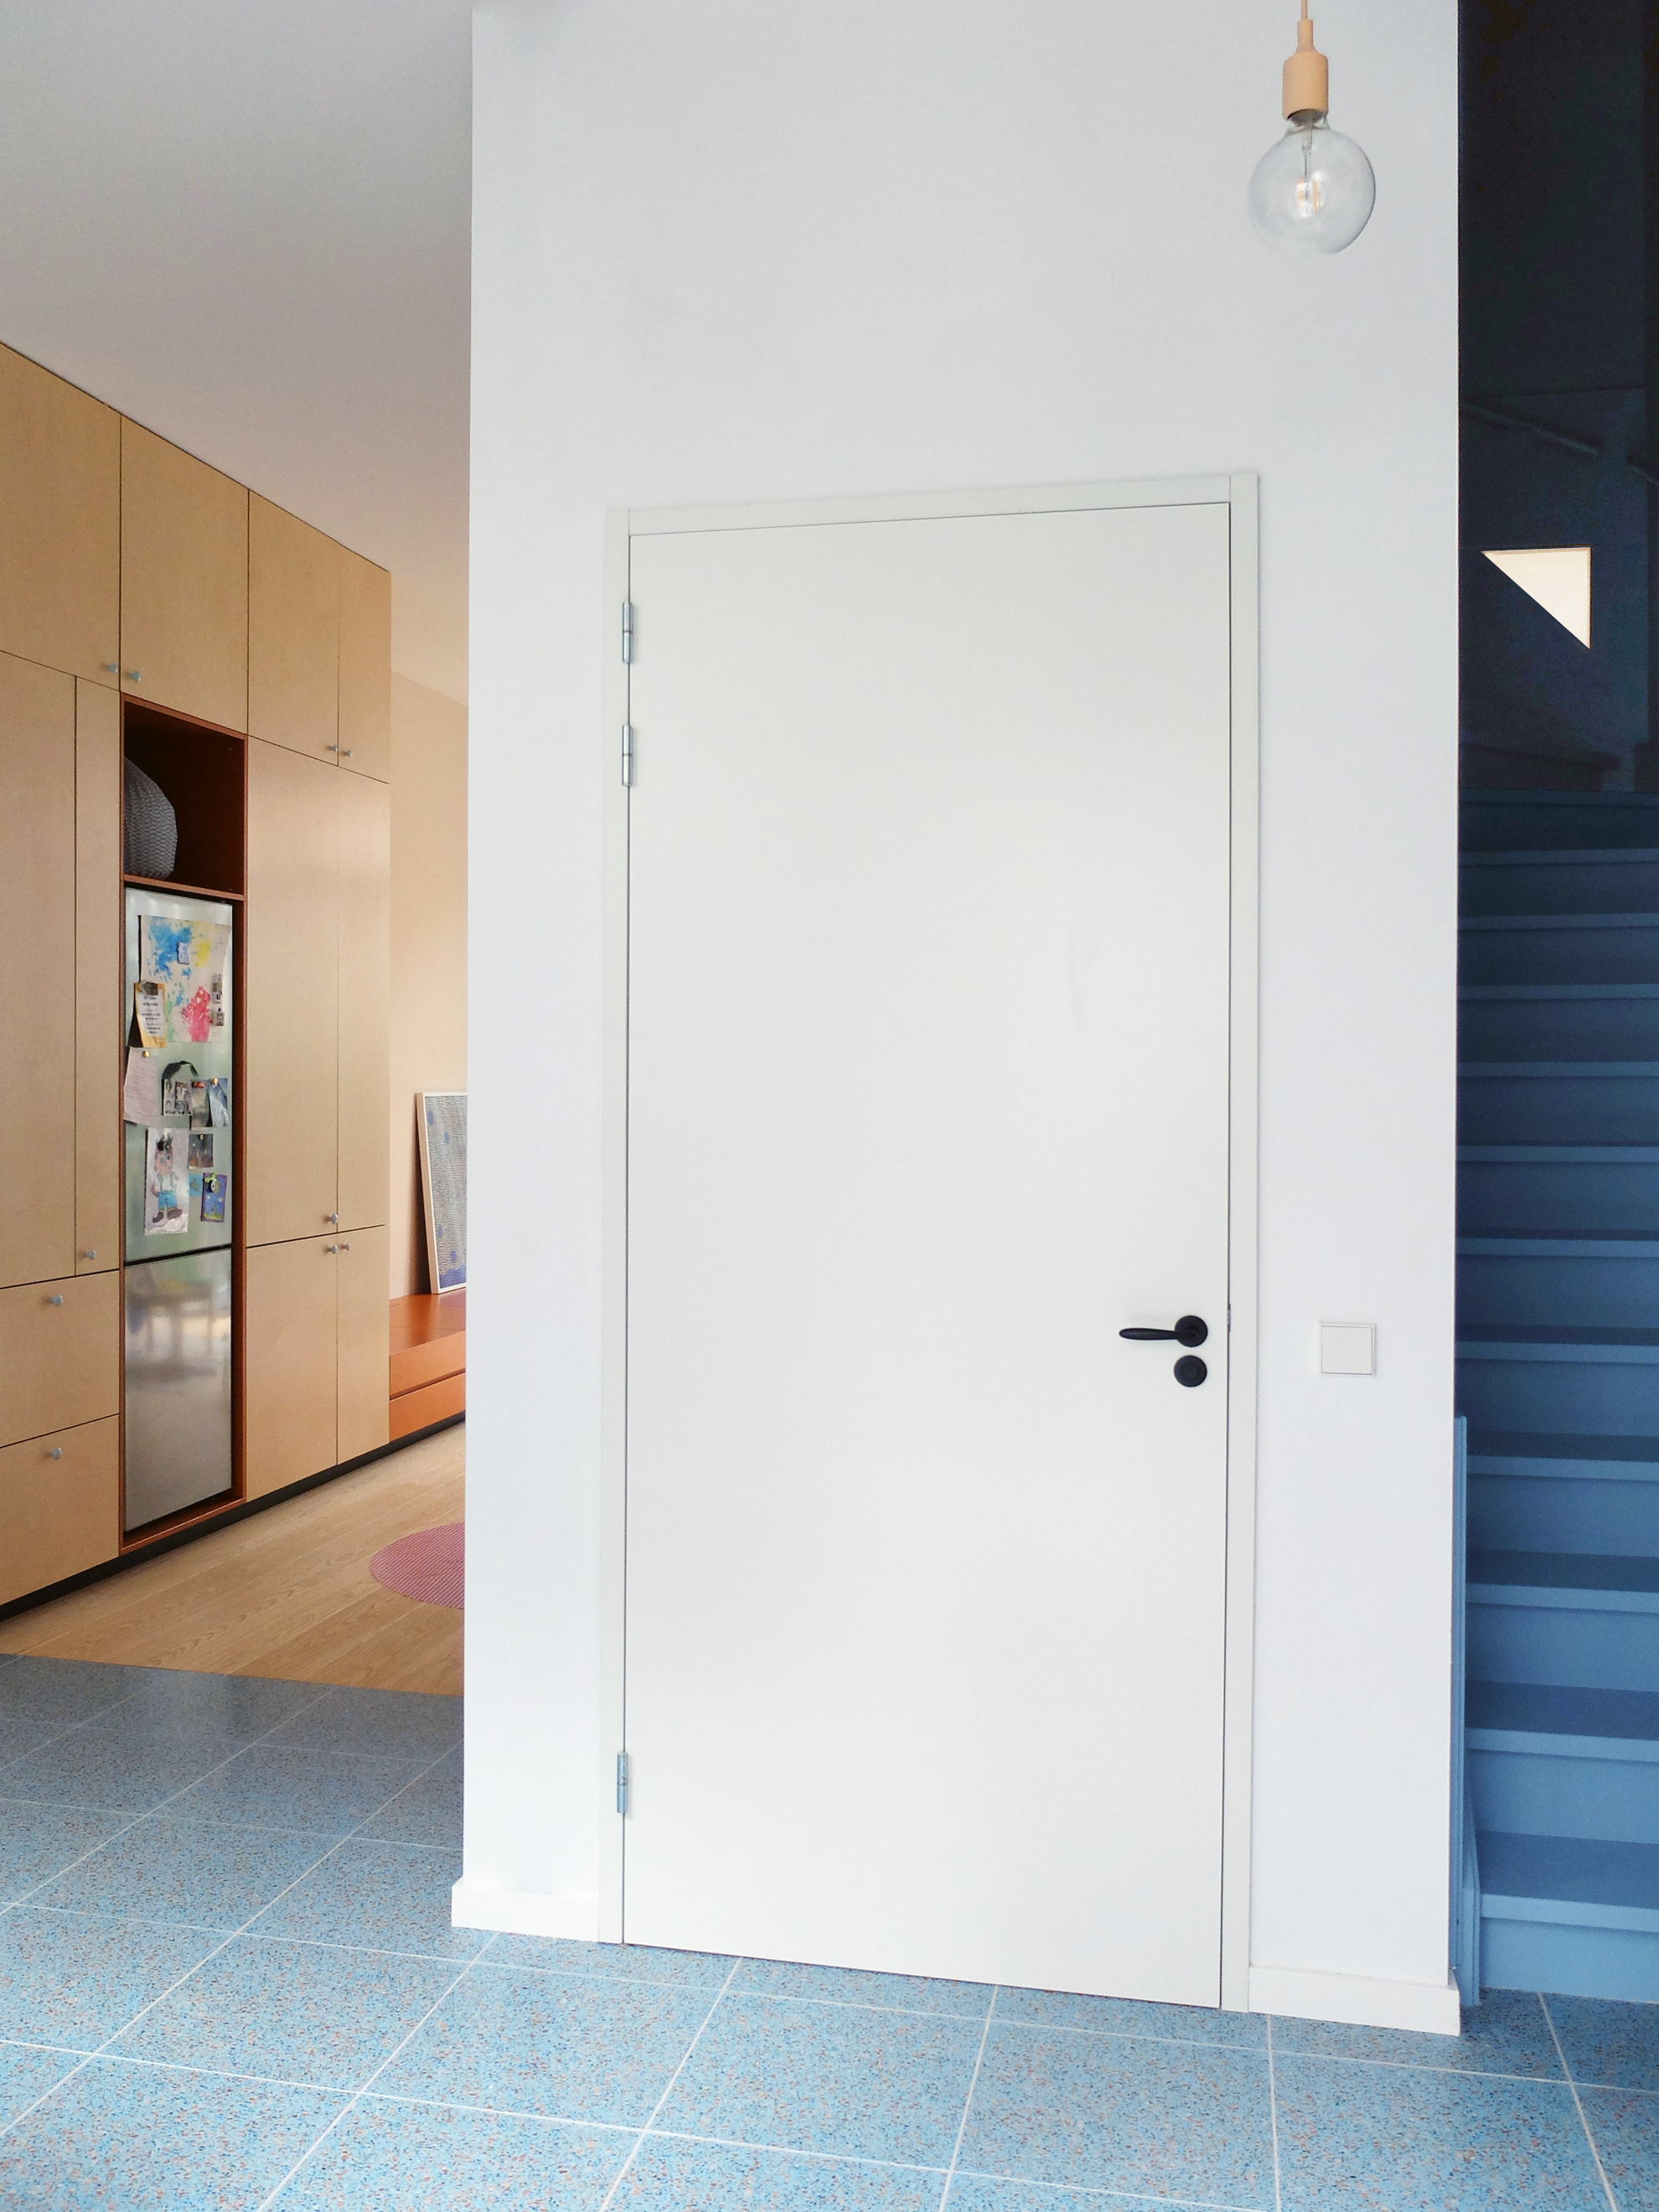 <p>Royale binnenkomst doordat keuken en hal in elkaar overlopen – foto: LAGADO architects </p>